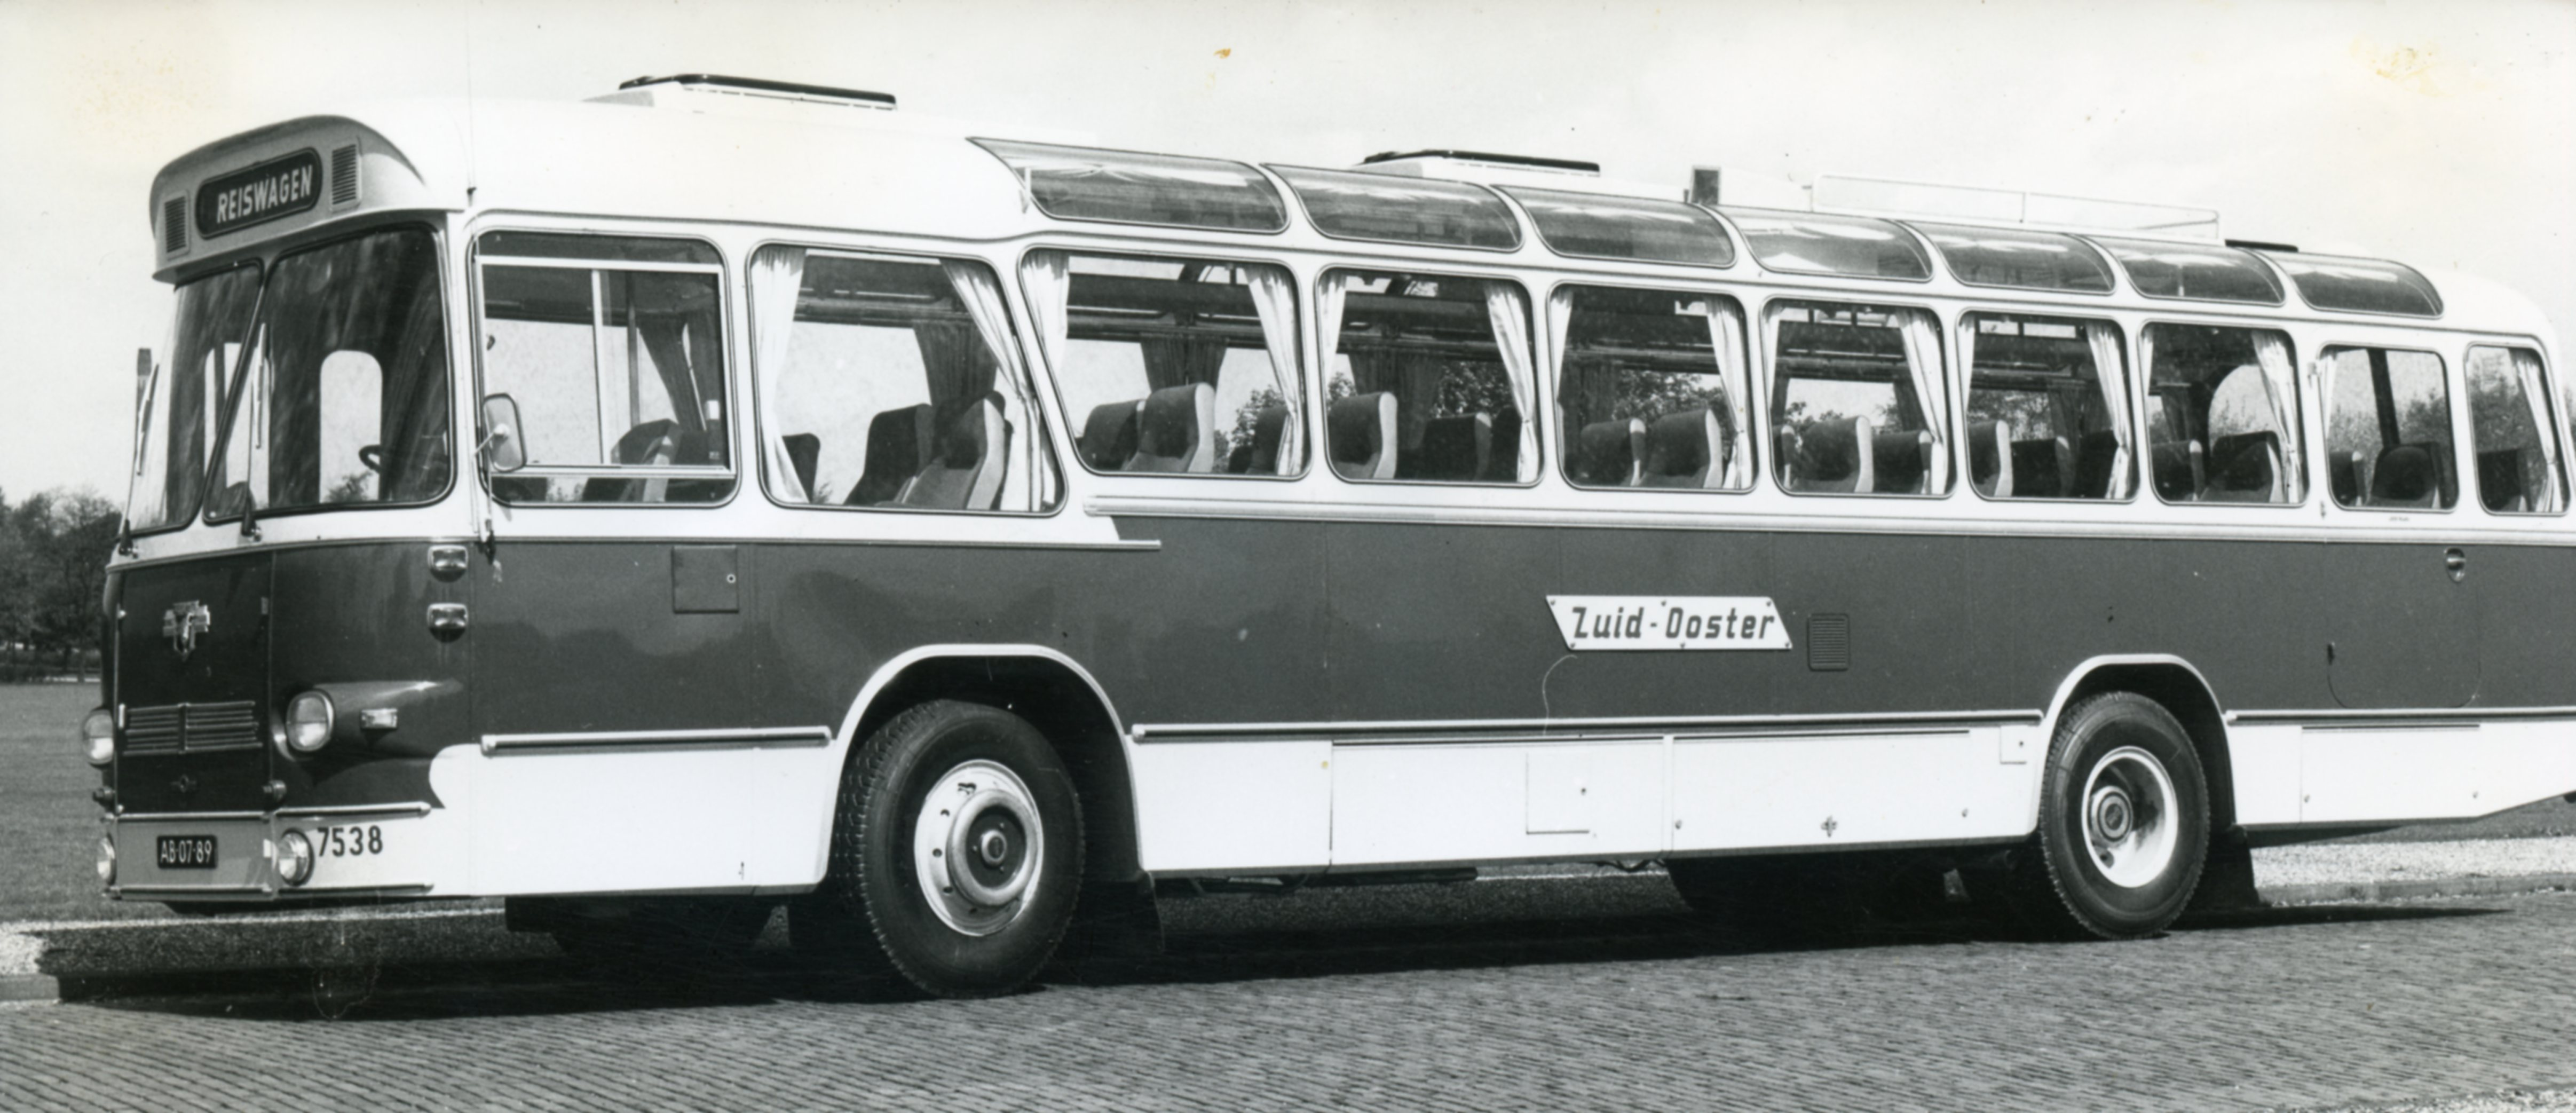 7504-AB0789-1965